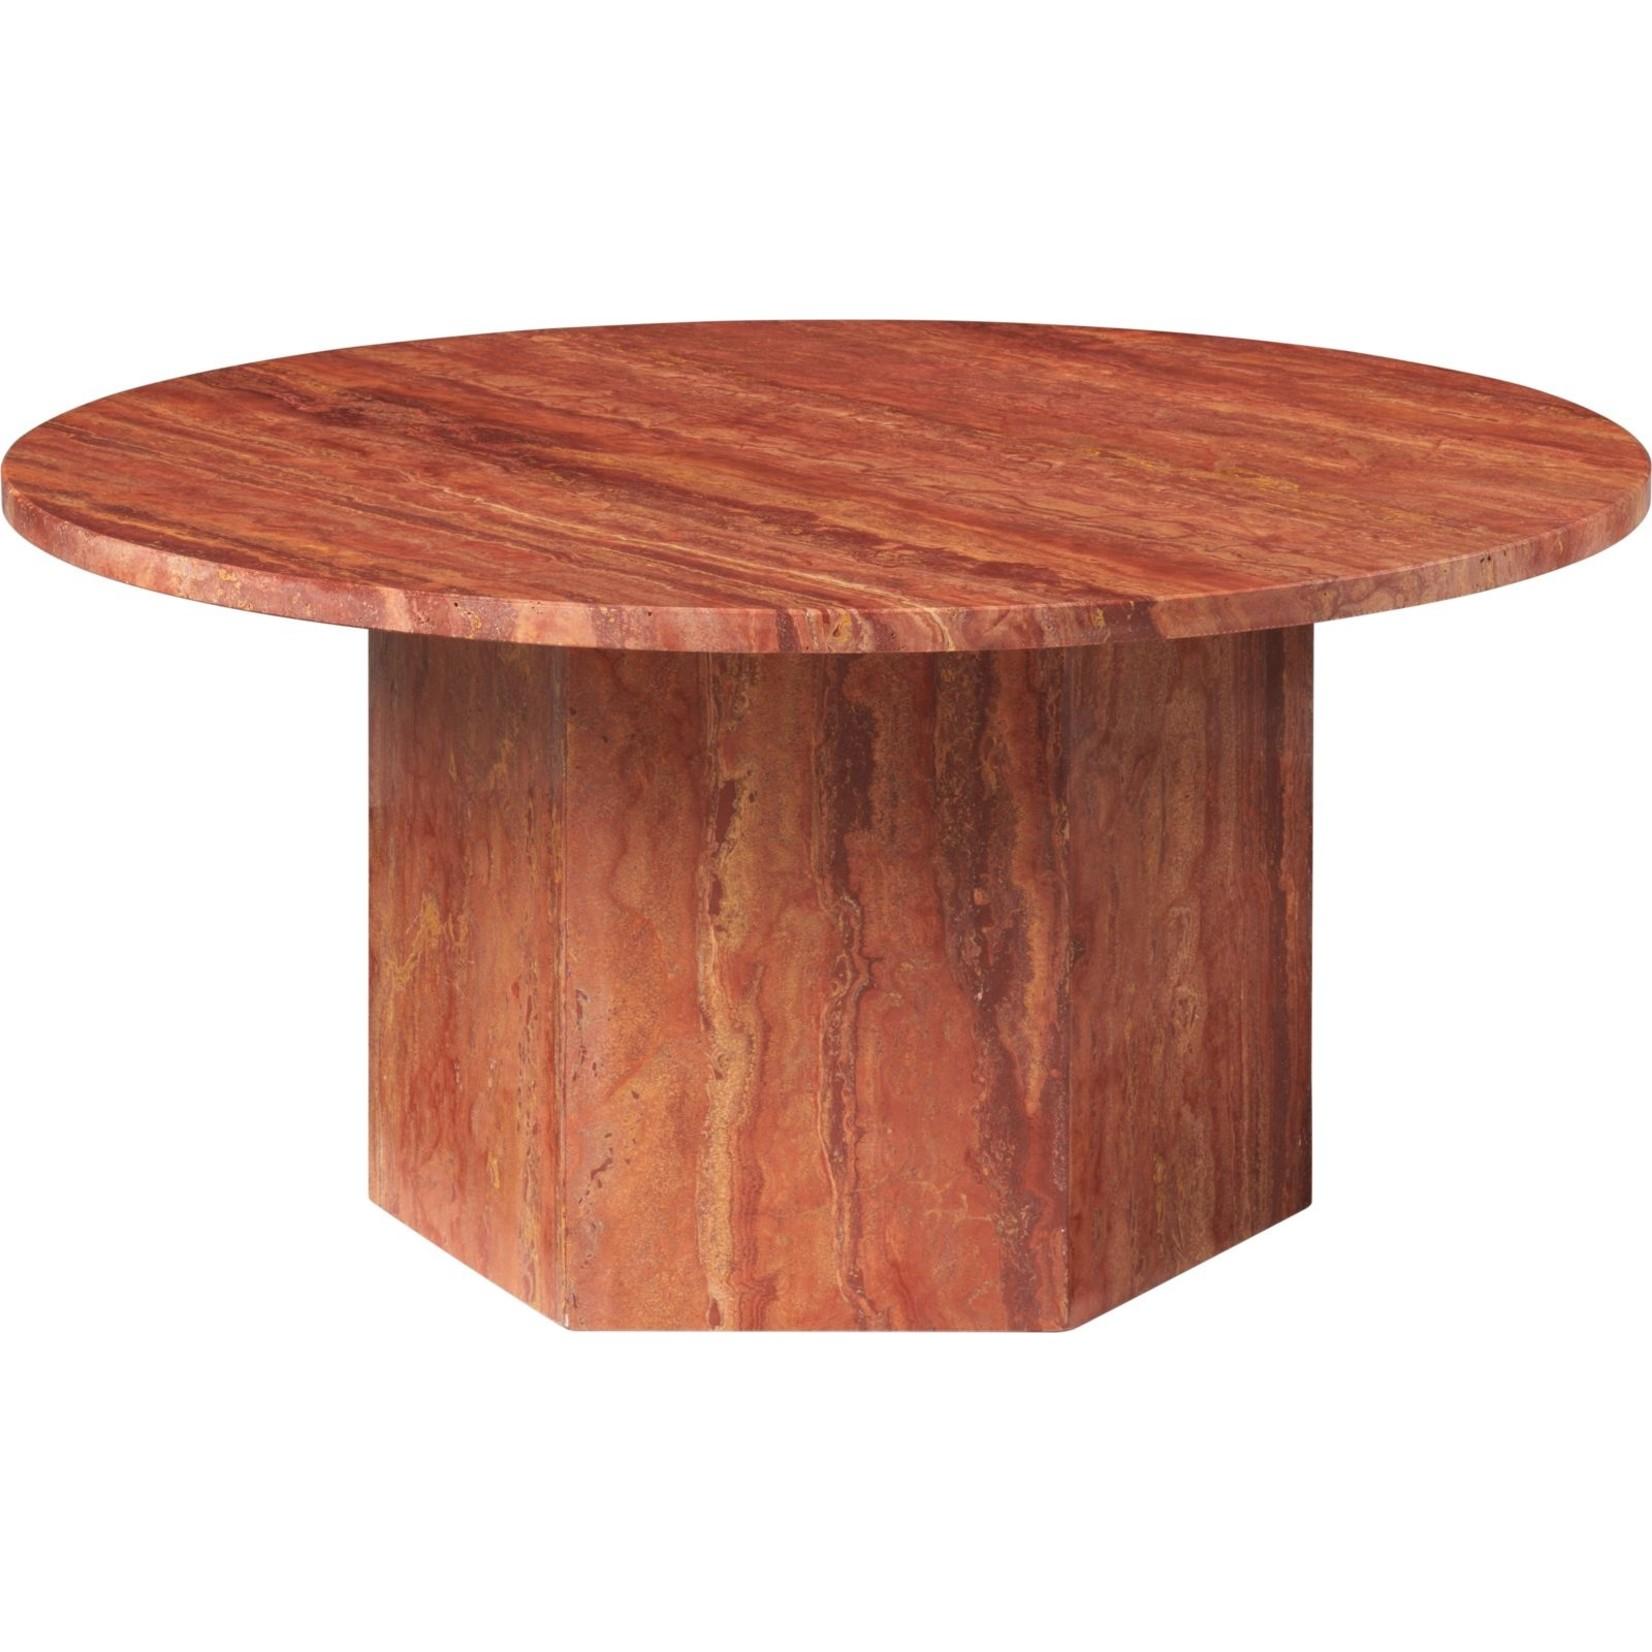 Gubi Epic Coffee Table Round Ø80 | Red Travertine